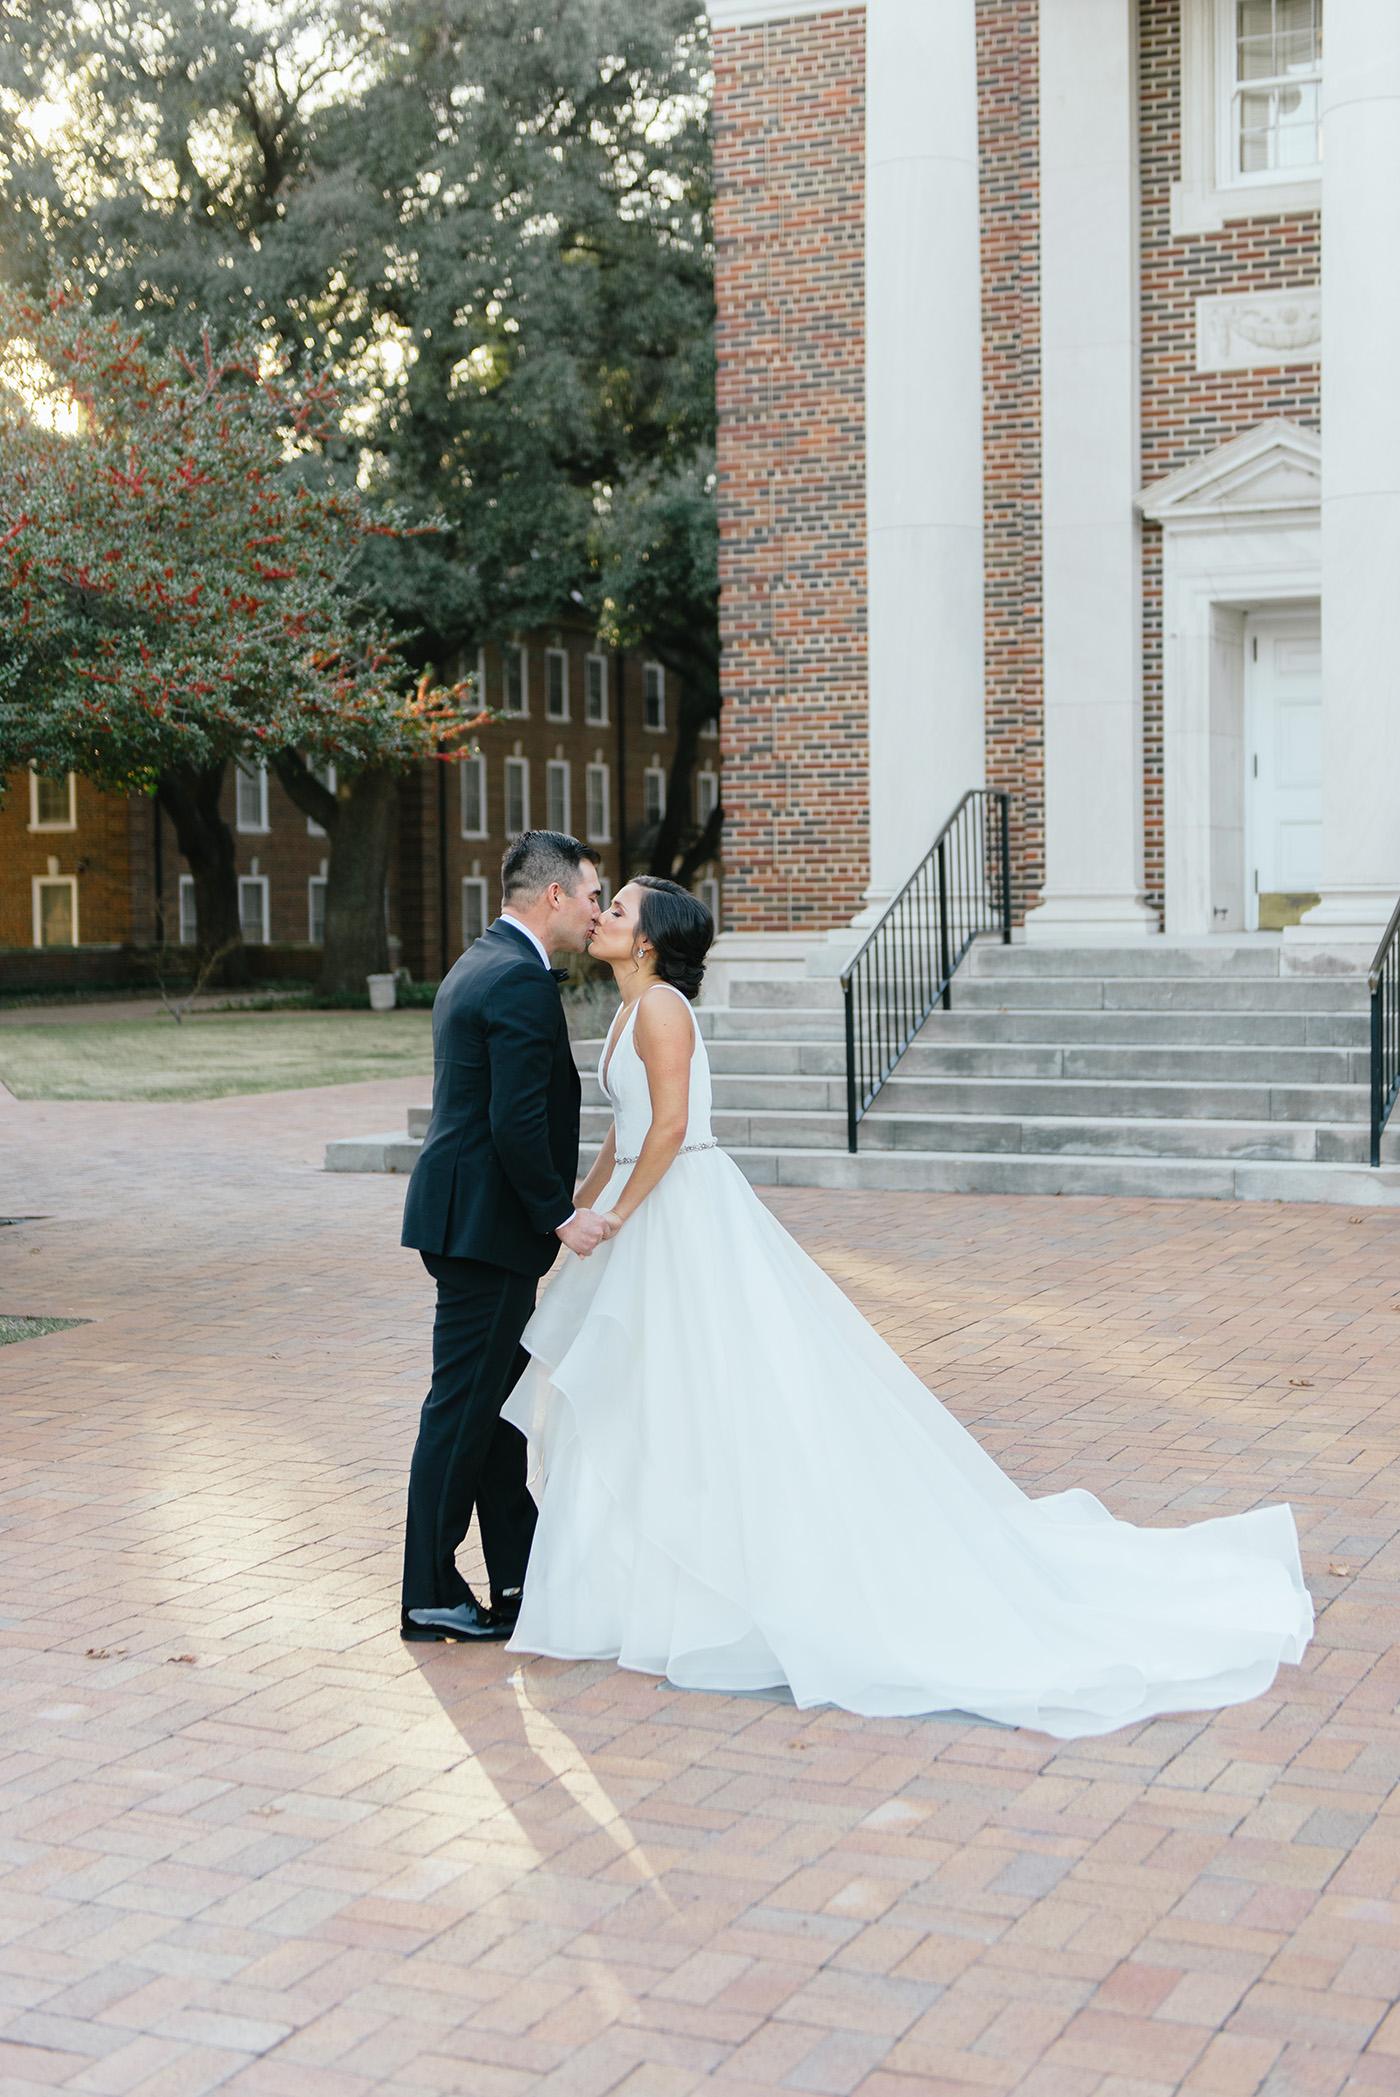 Dallas Wedding Planner - Winter Wedding at The Room on Main - Allday Events - 116.jpg